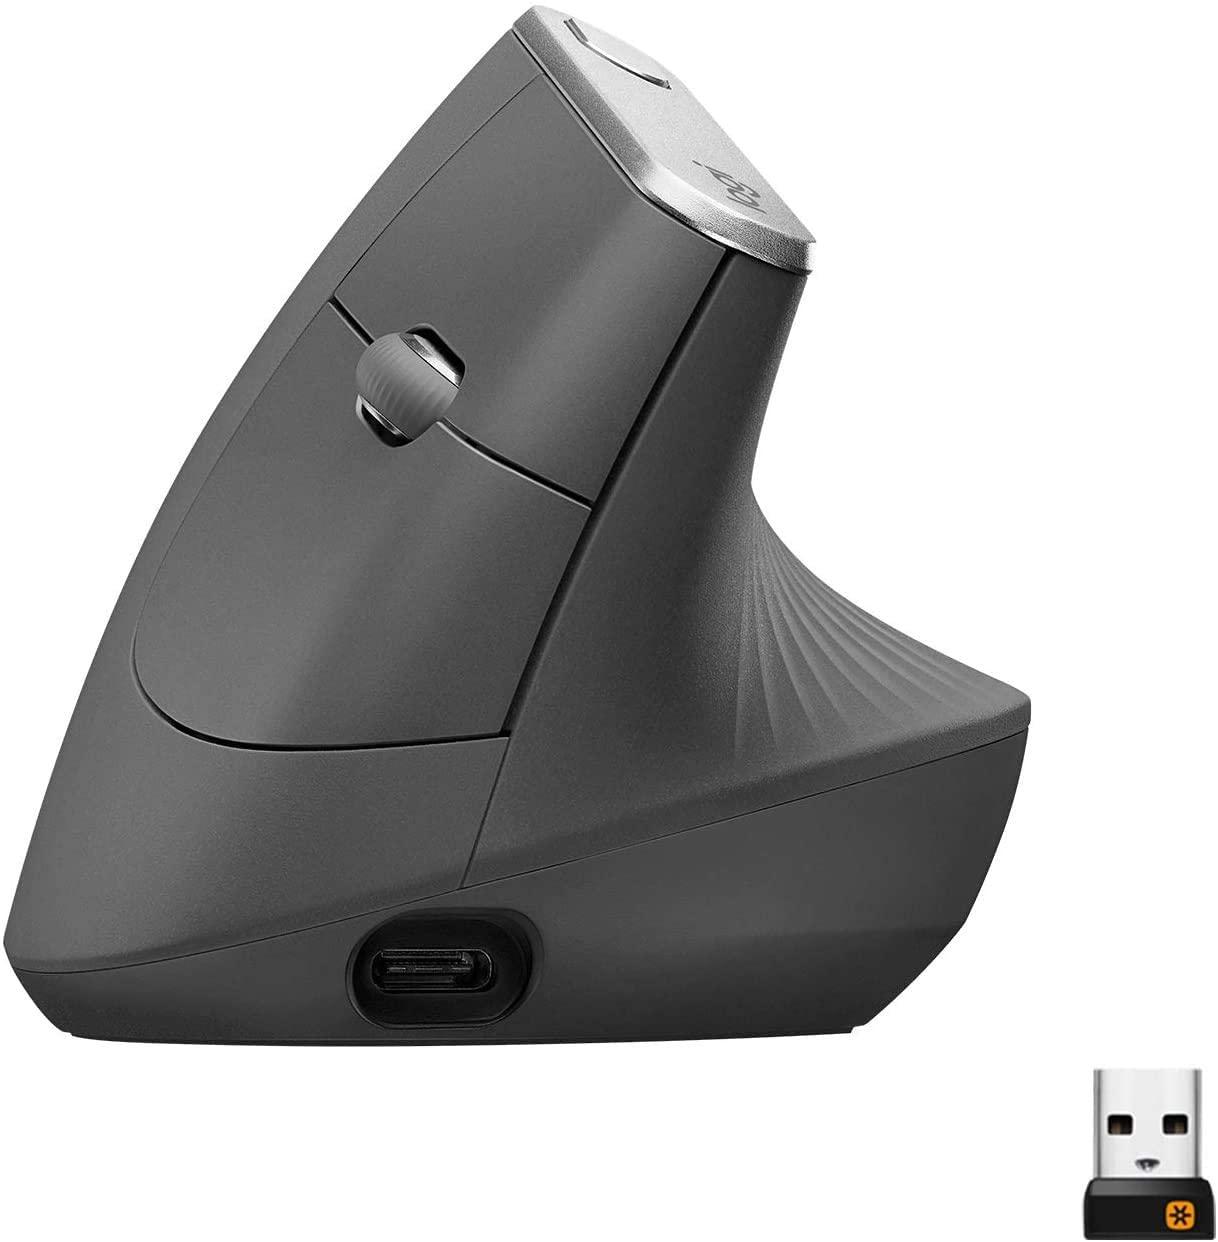 Raton vertical Logitech MX